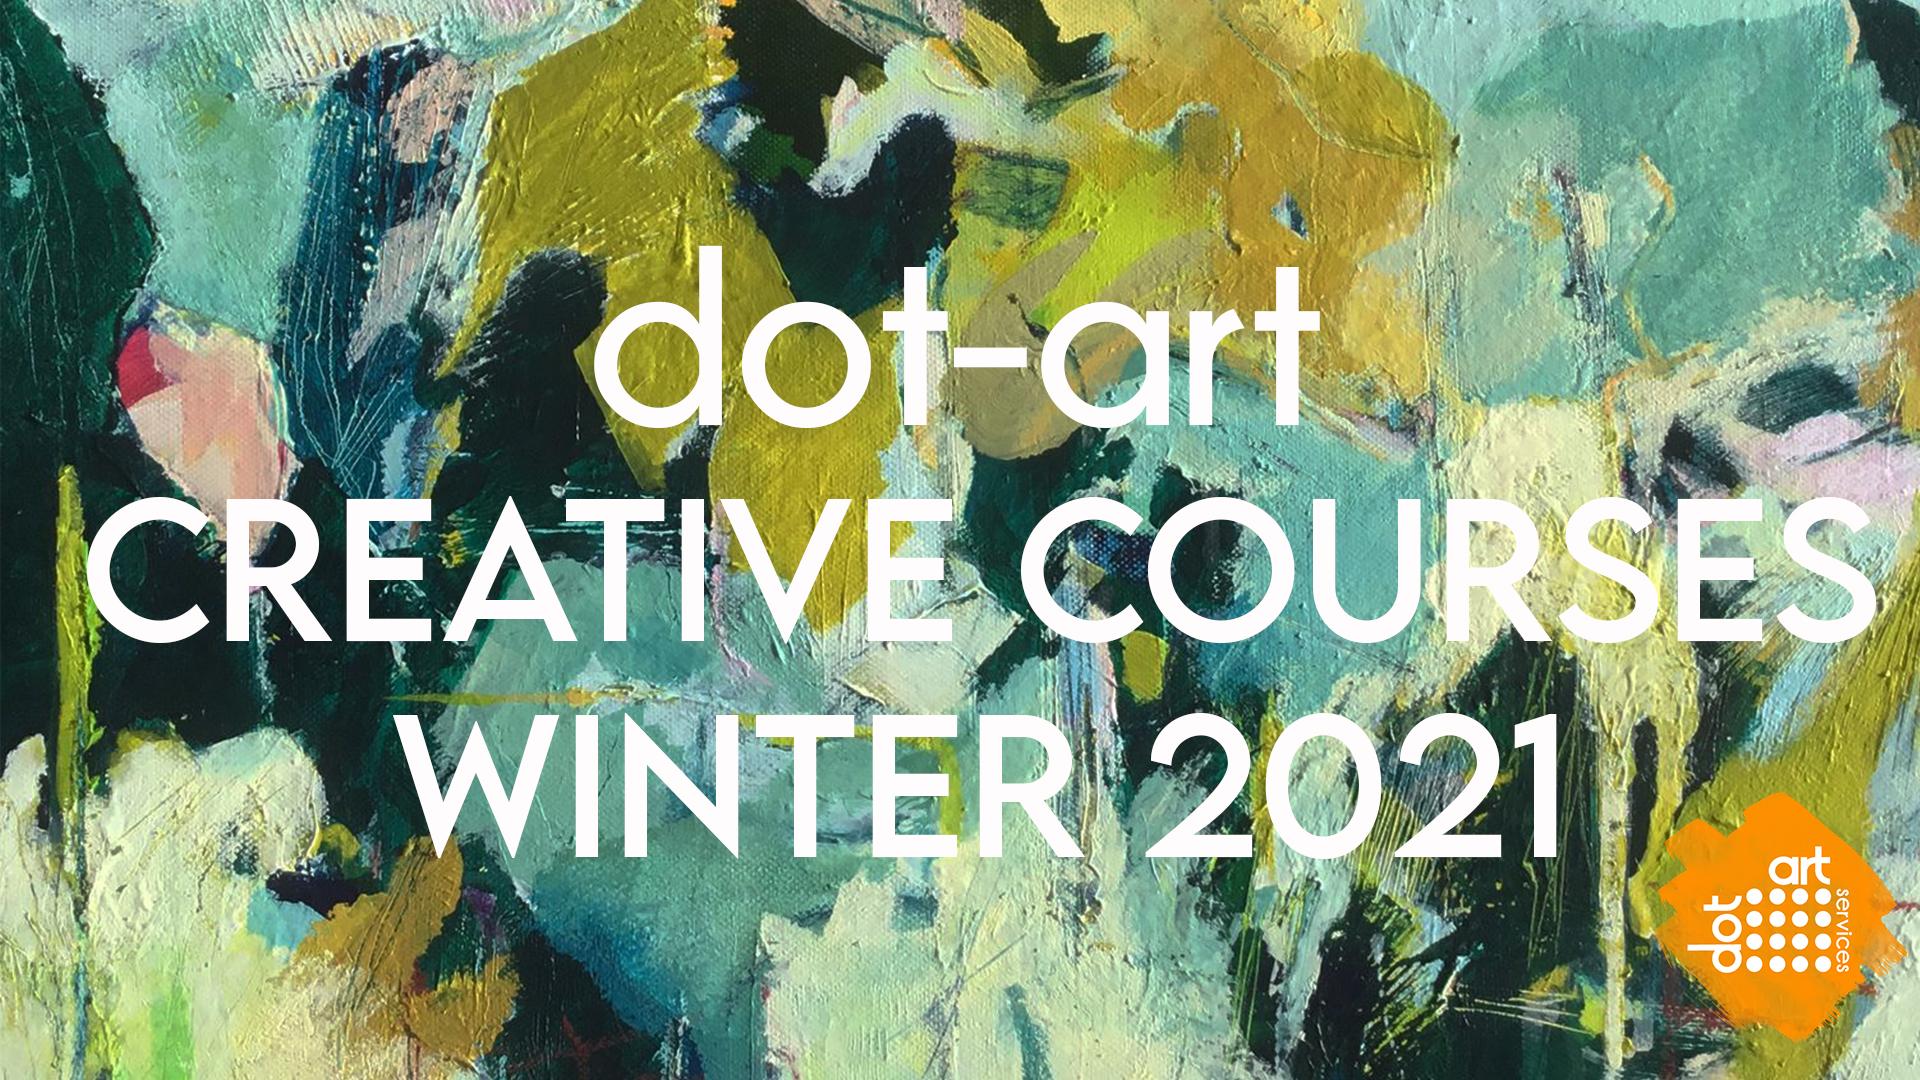 Creative courses winter 2021